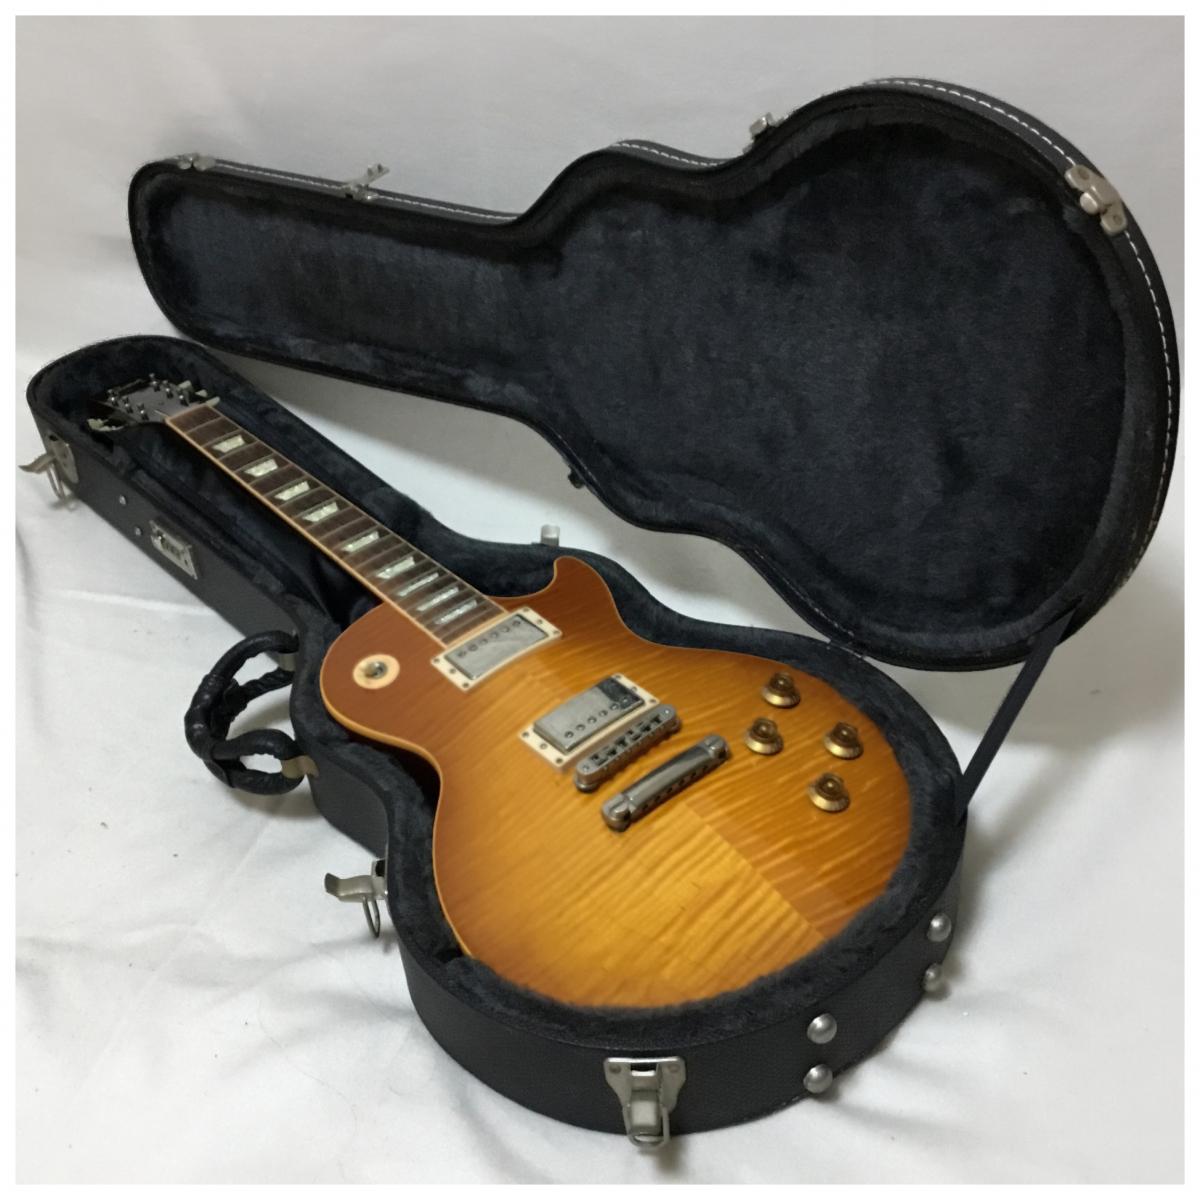 GIBSON ギブソン USA LesPaul Standard レスポール エレキギター 2004年製 ネック割れ